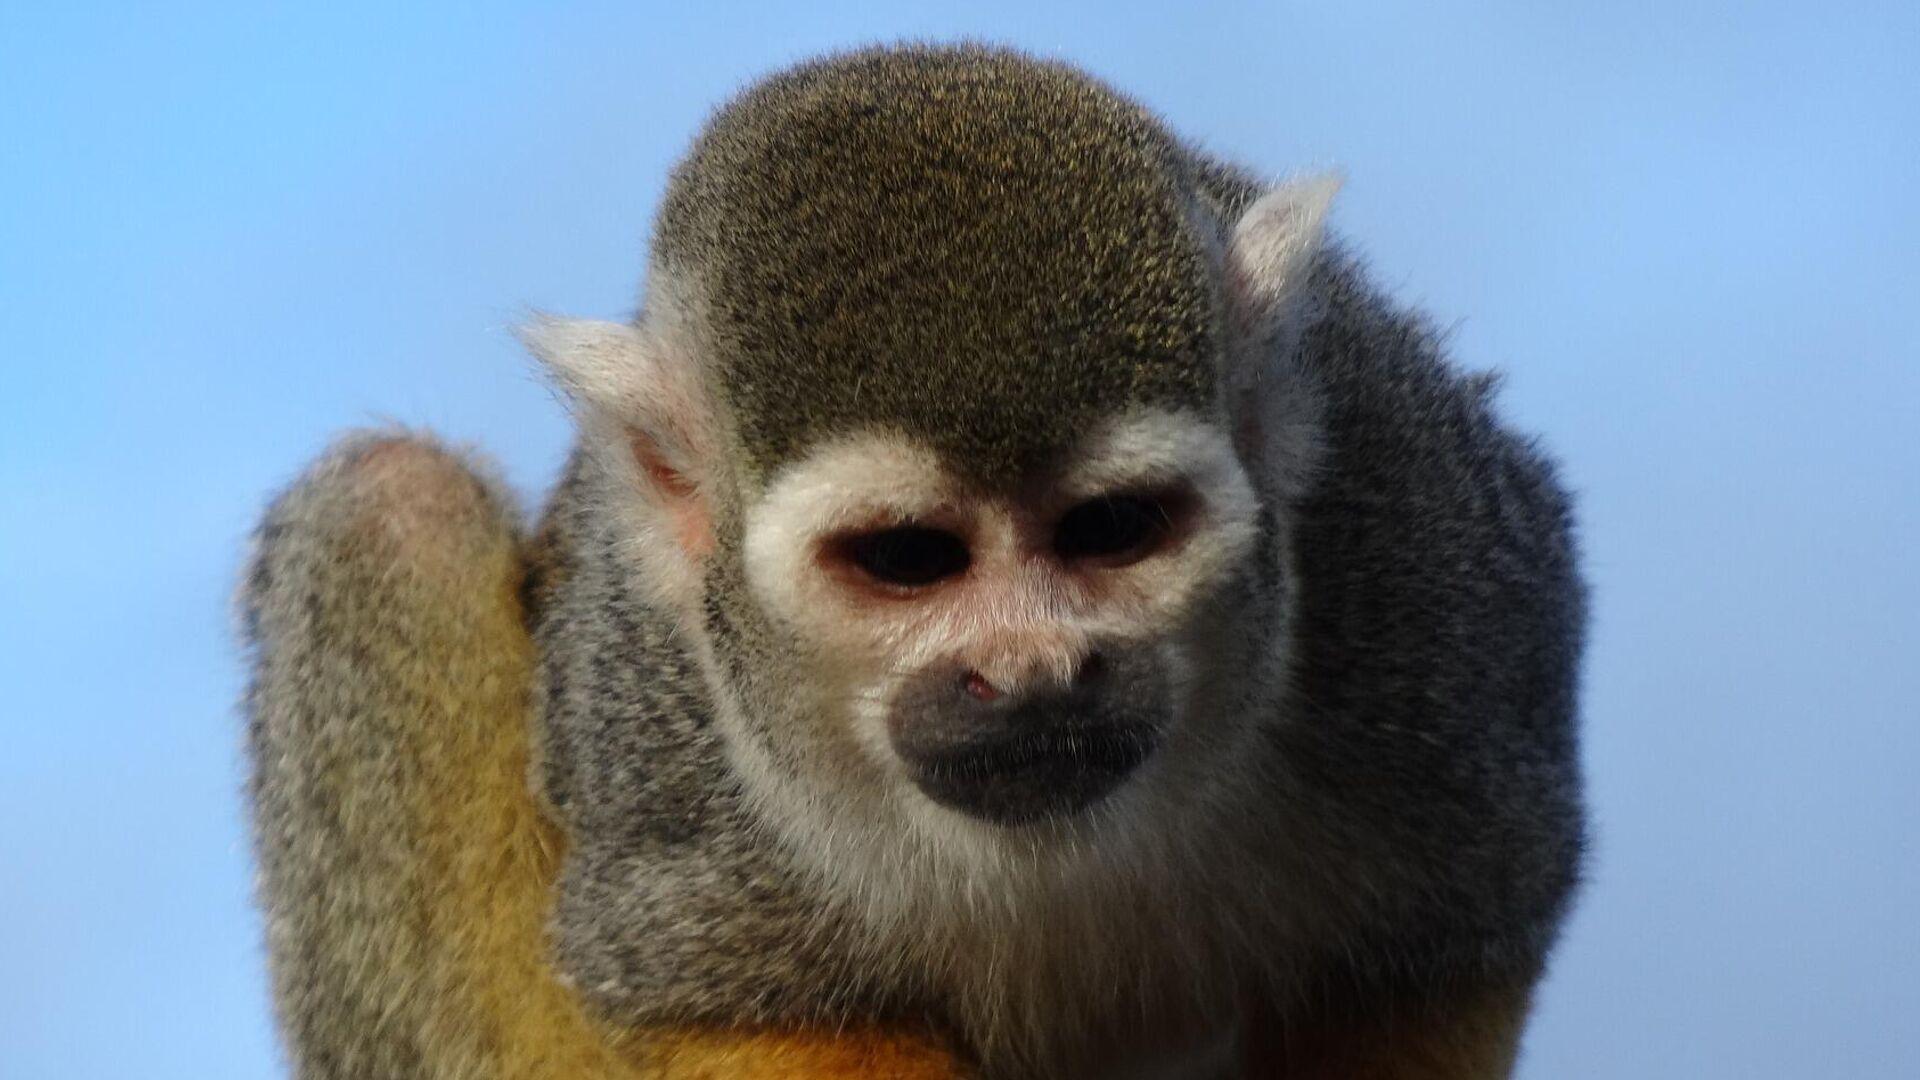 Un mono araña, imagen referencial - Sputnik Mundo, 1920, 28.09.2021